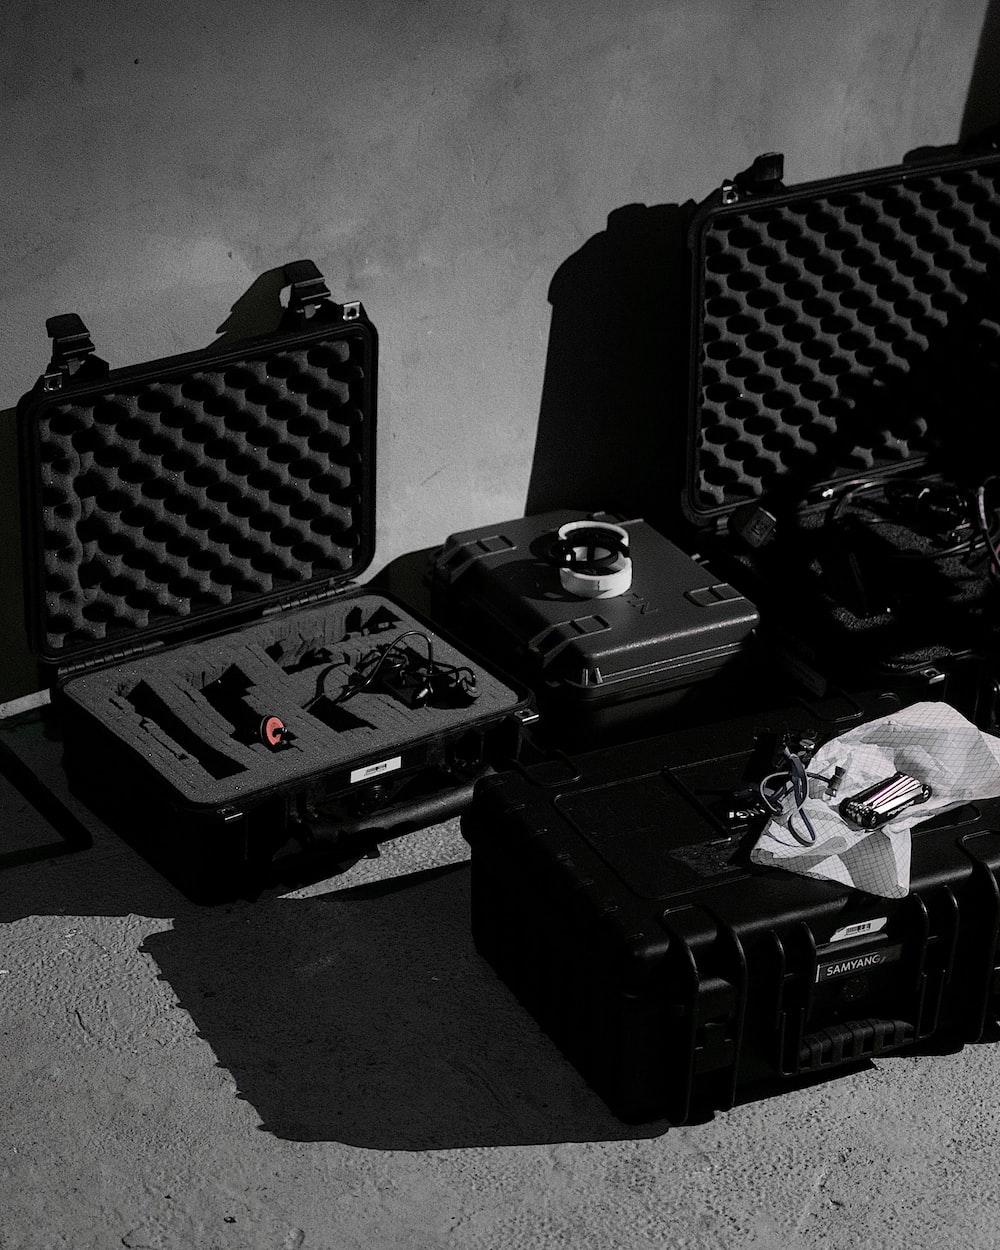 black hard cases